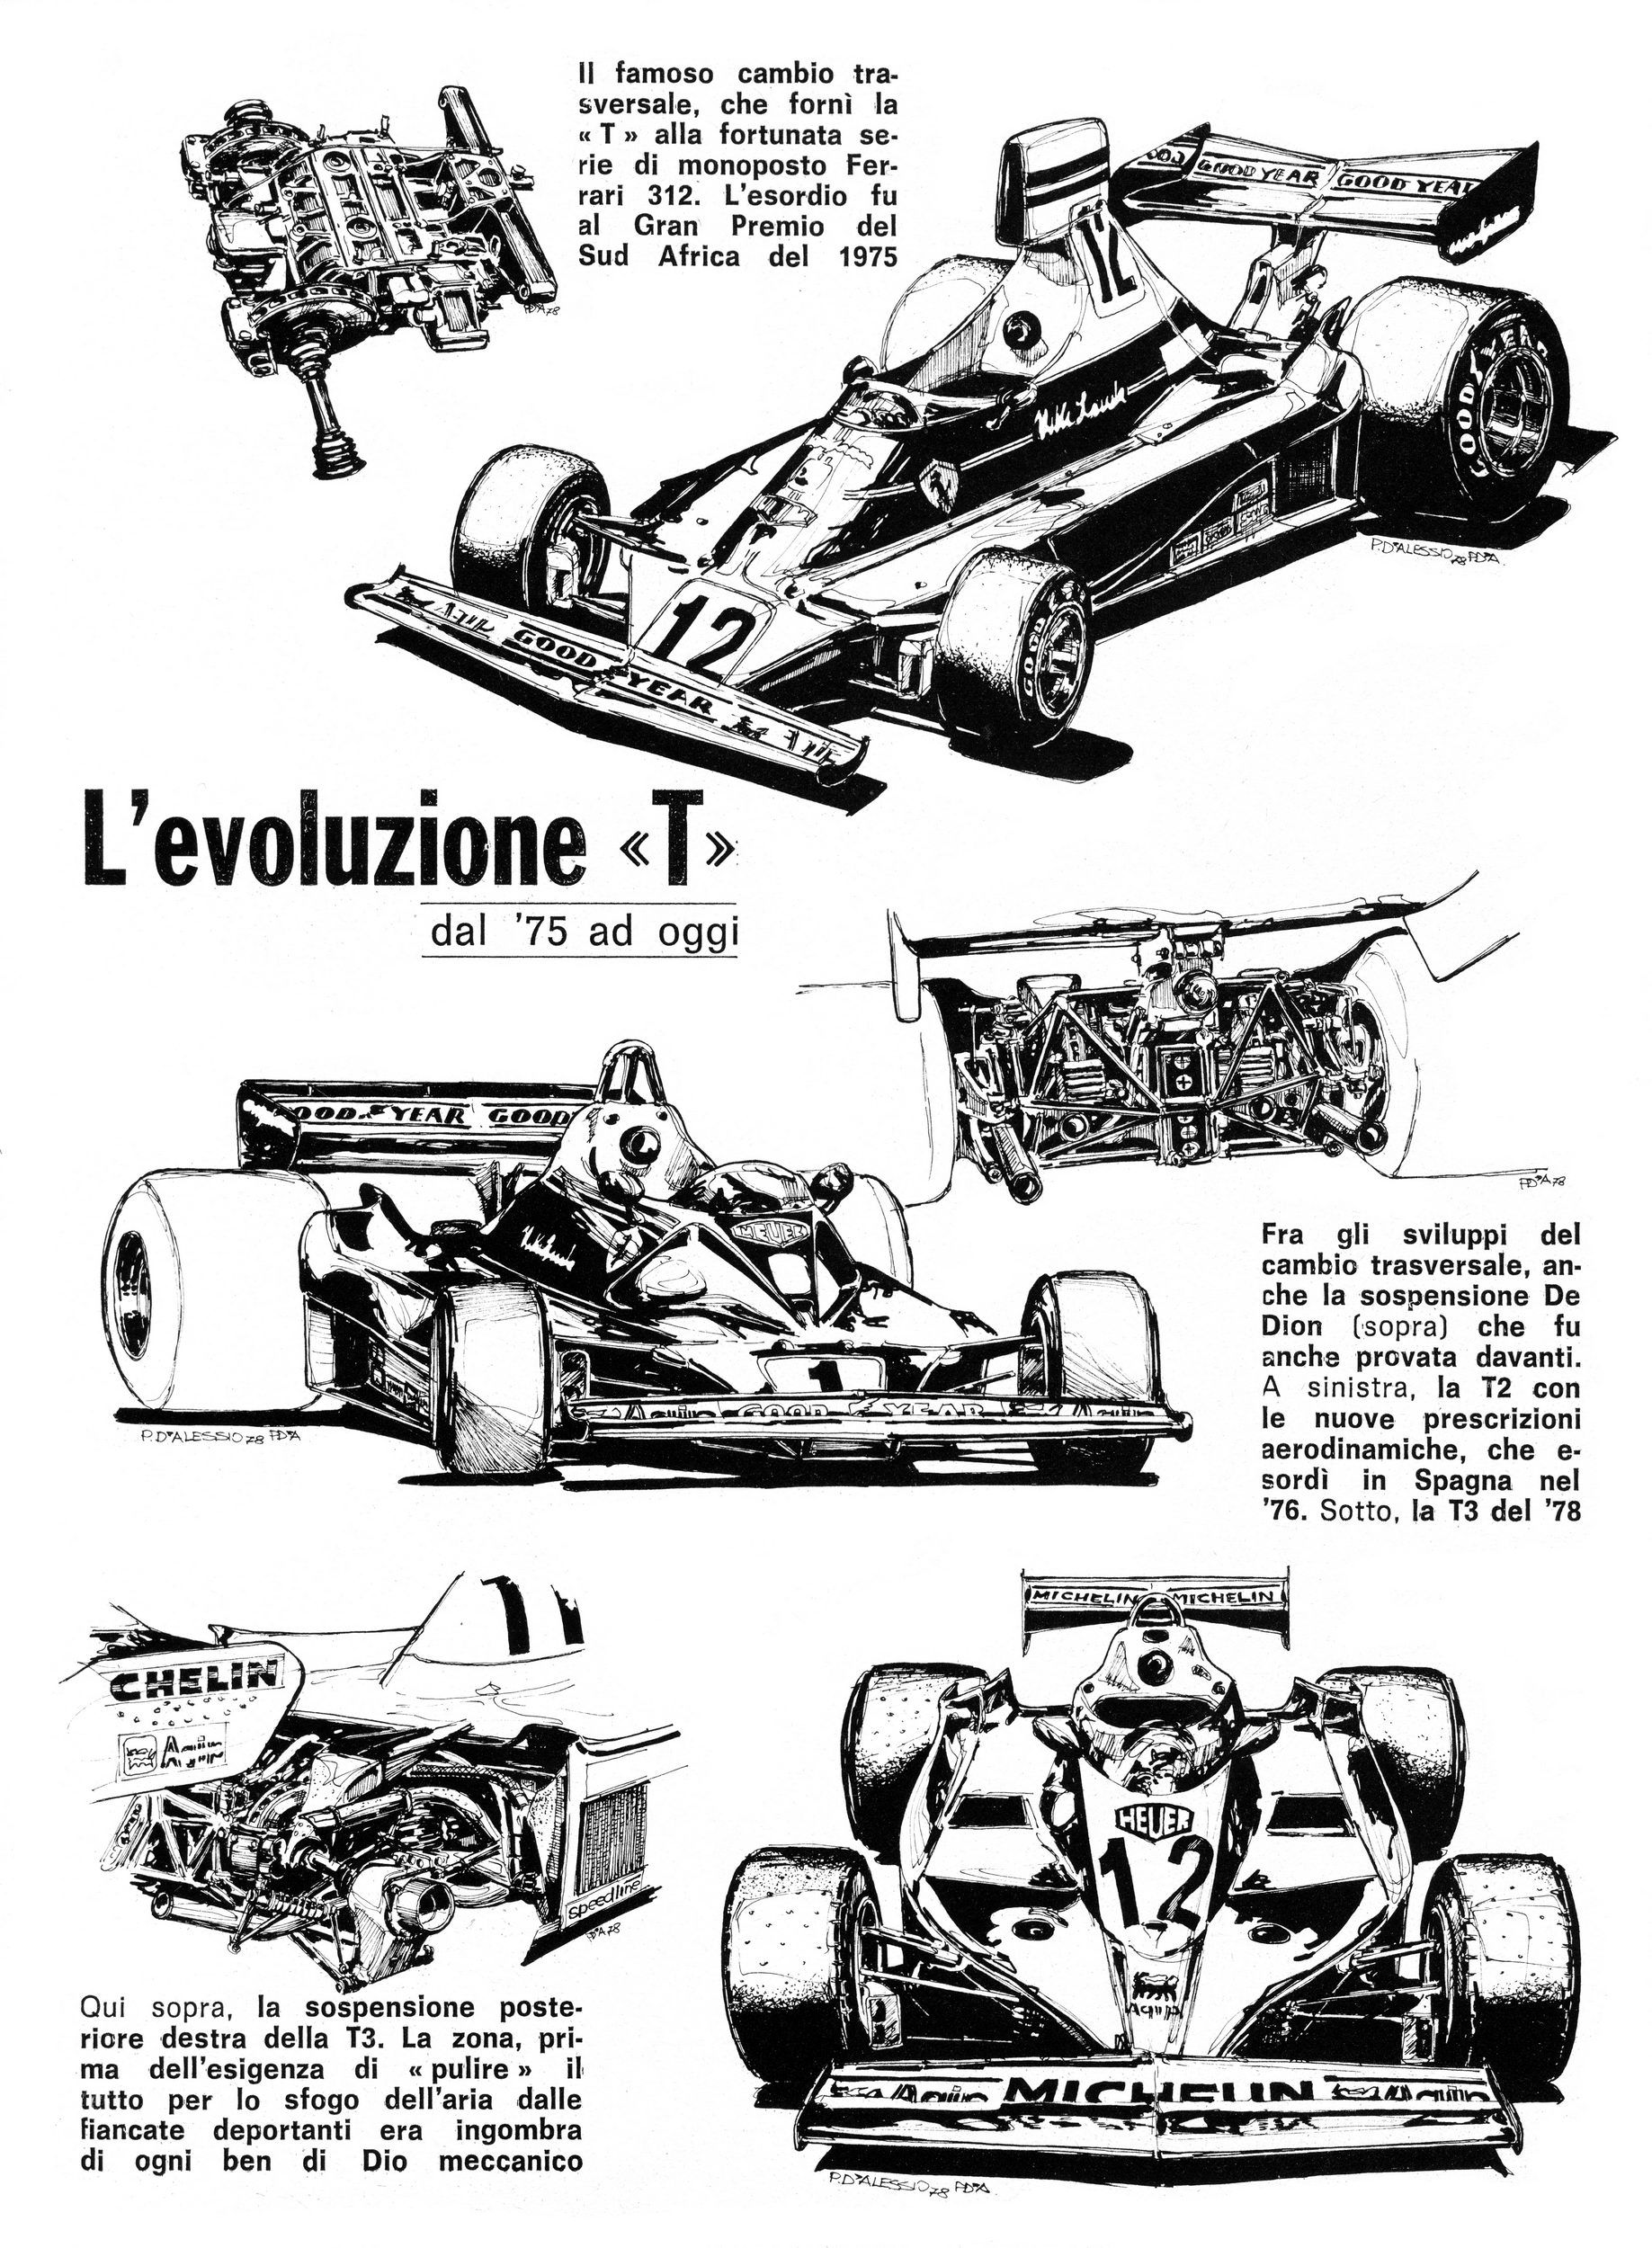 Ferrari 312 T Evolution Illustrated By Paolo D Alessio Cutaway